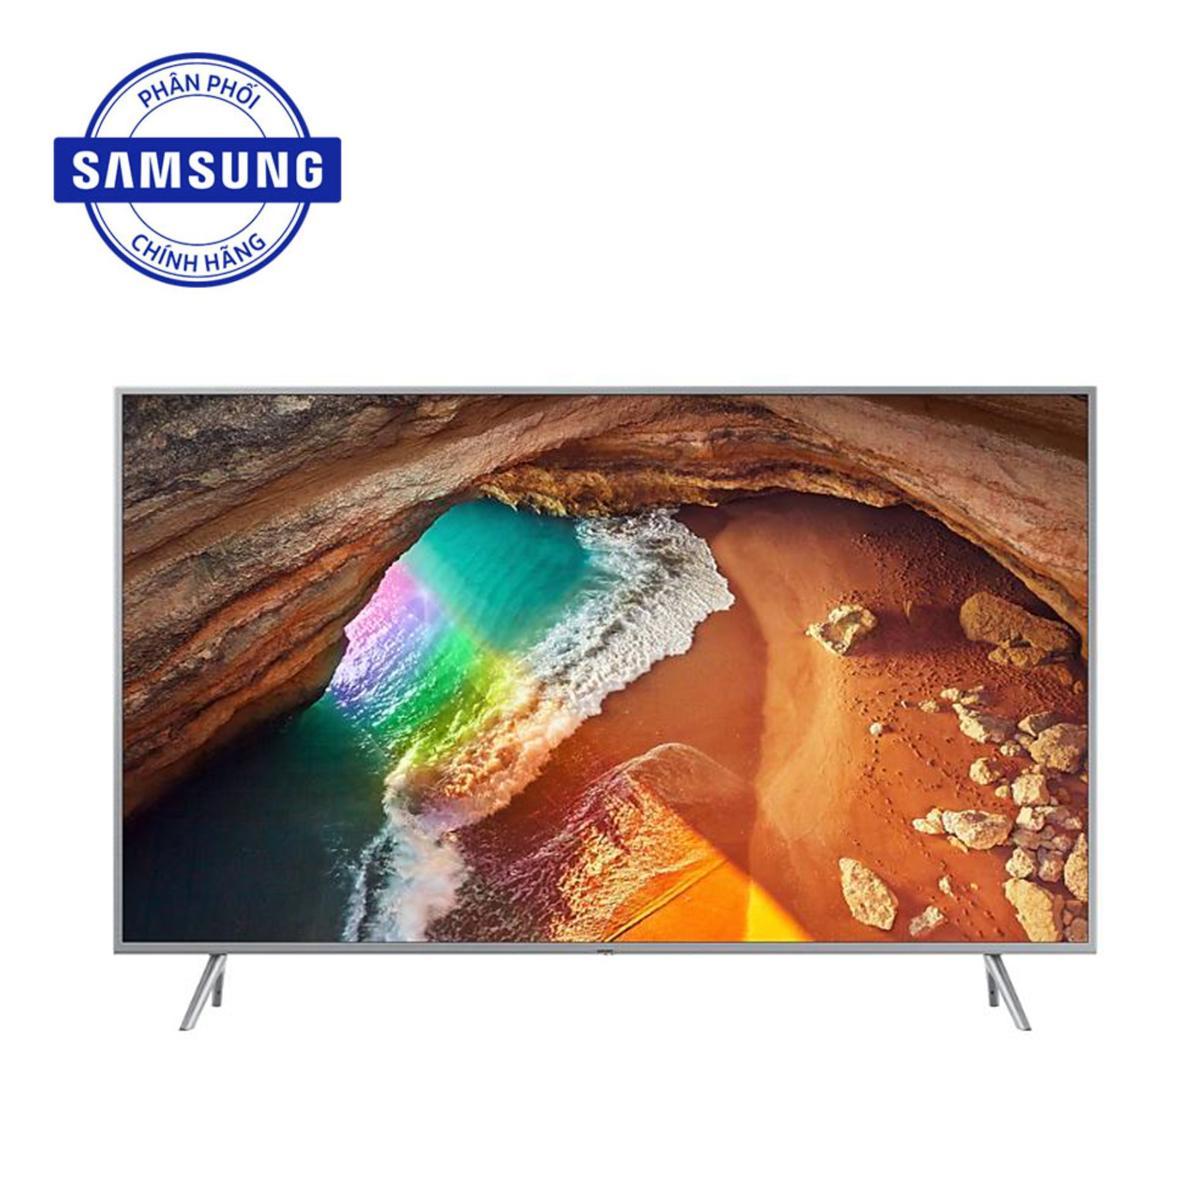 Smart TV 4K QLED 43 inch Q65R 2019